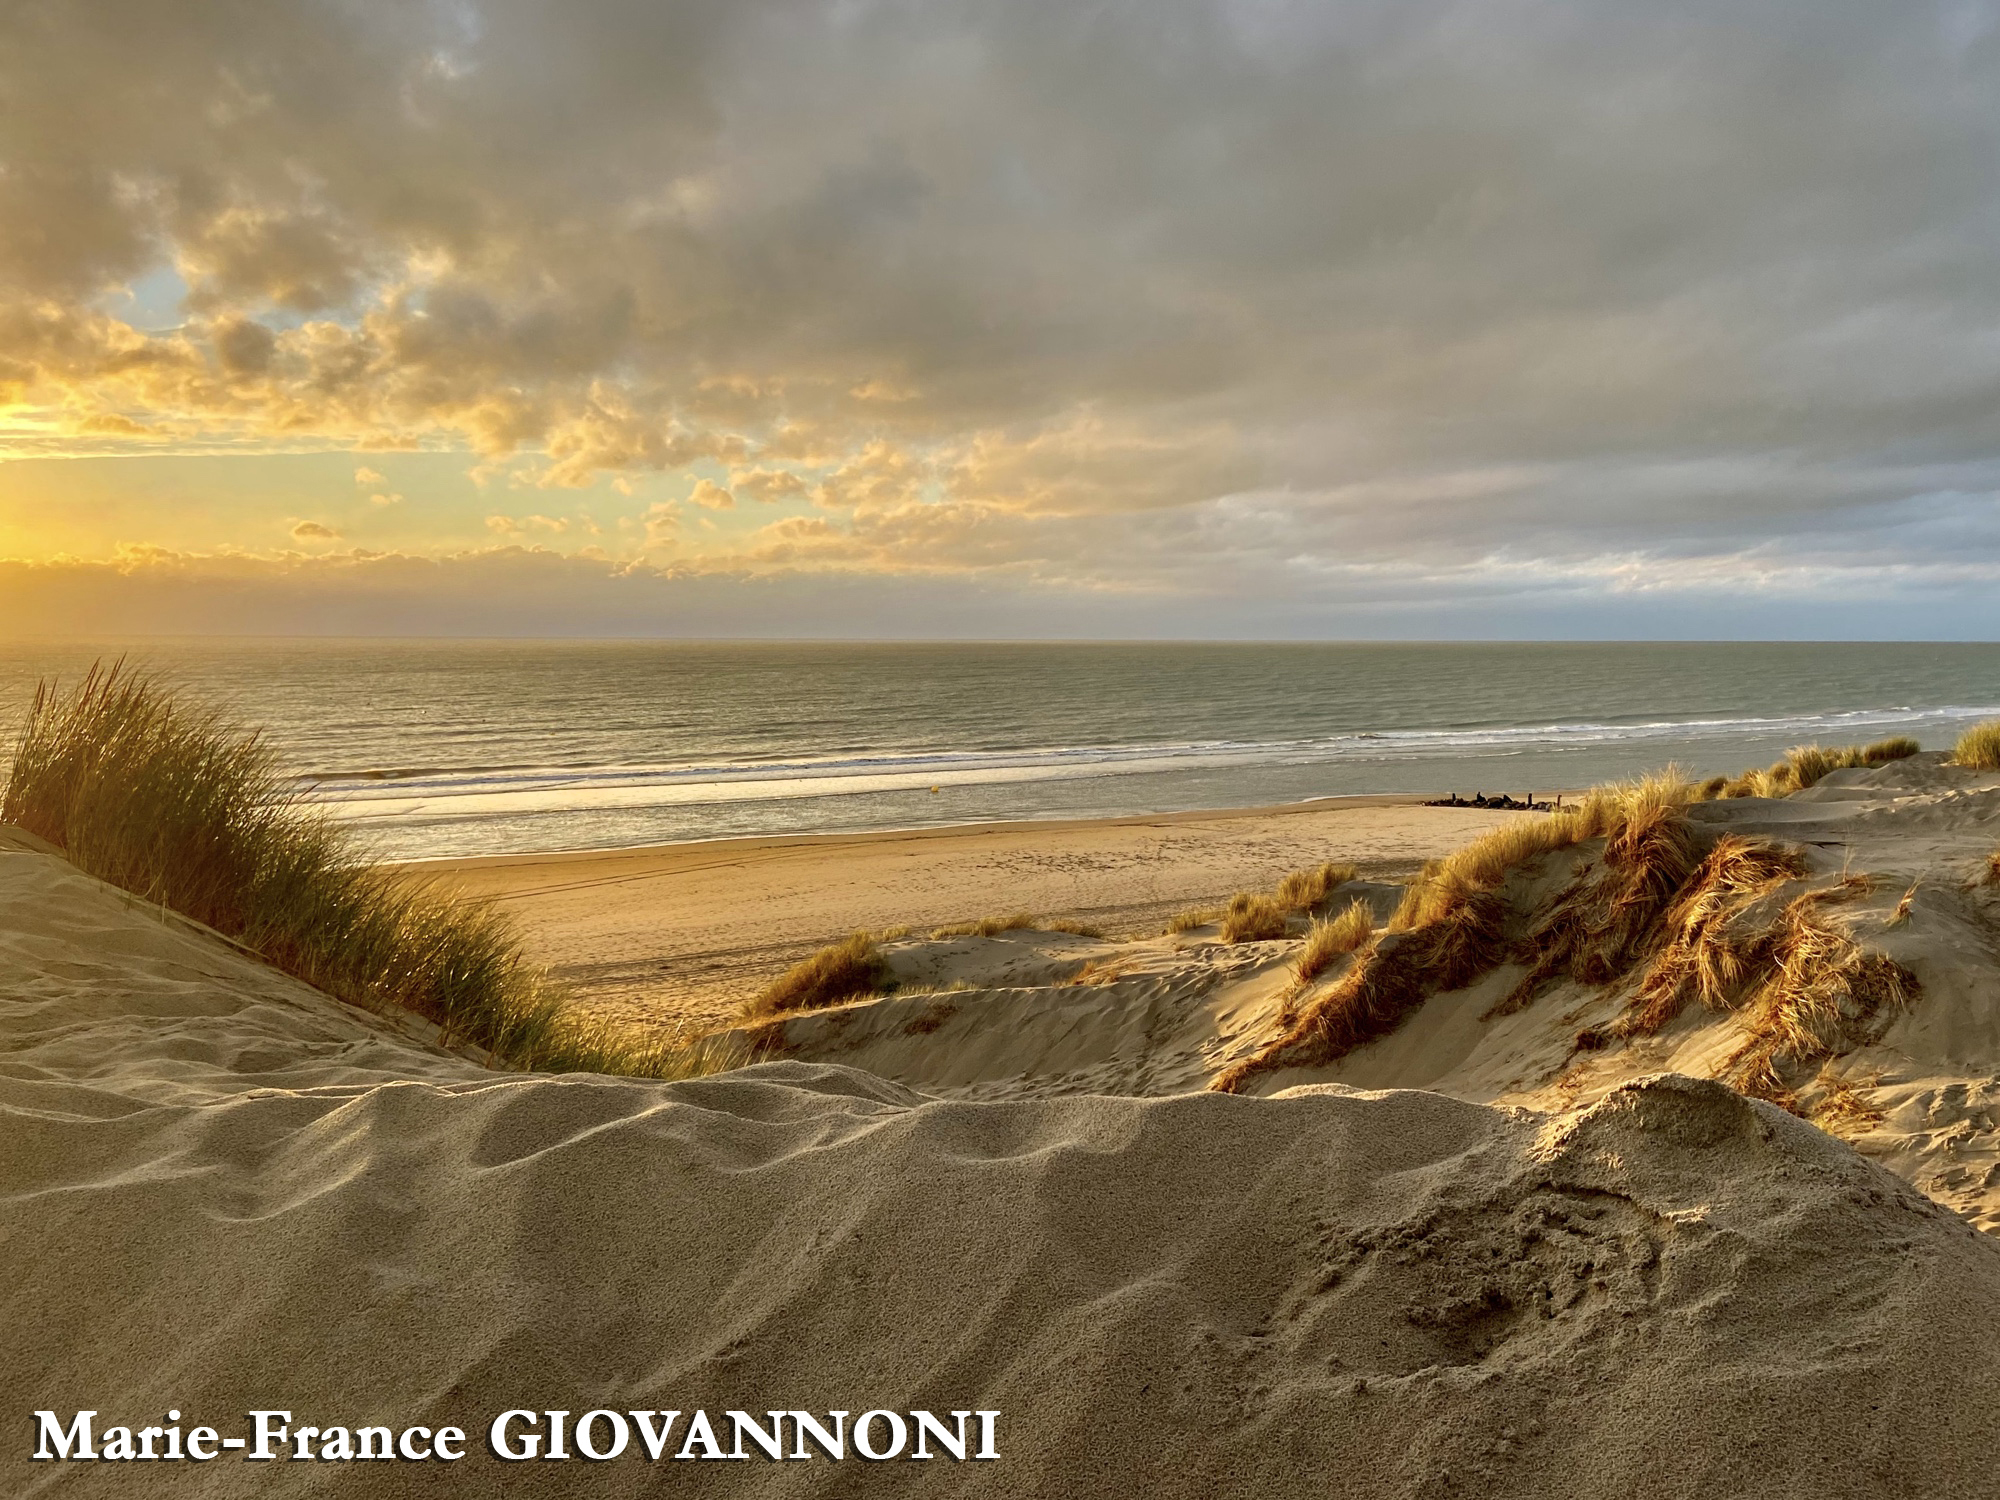 Marie-France Giovannoni